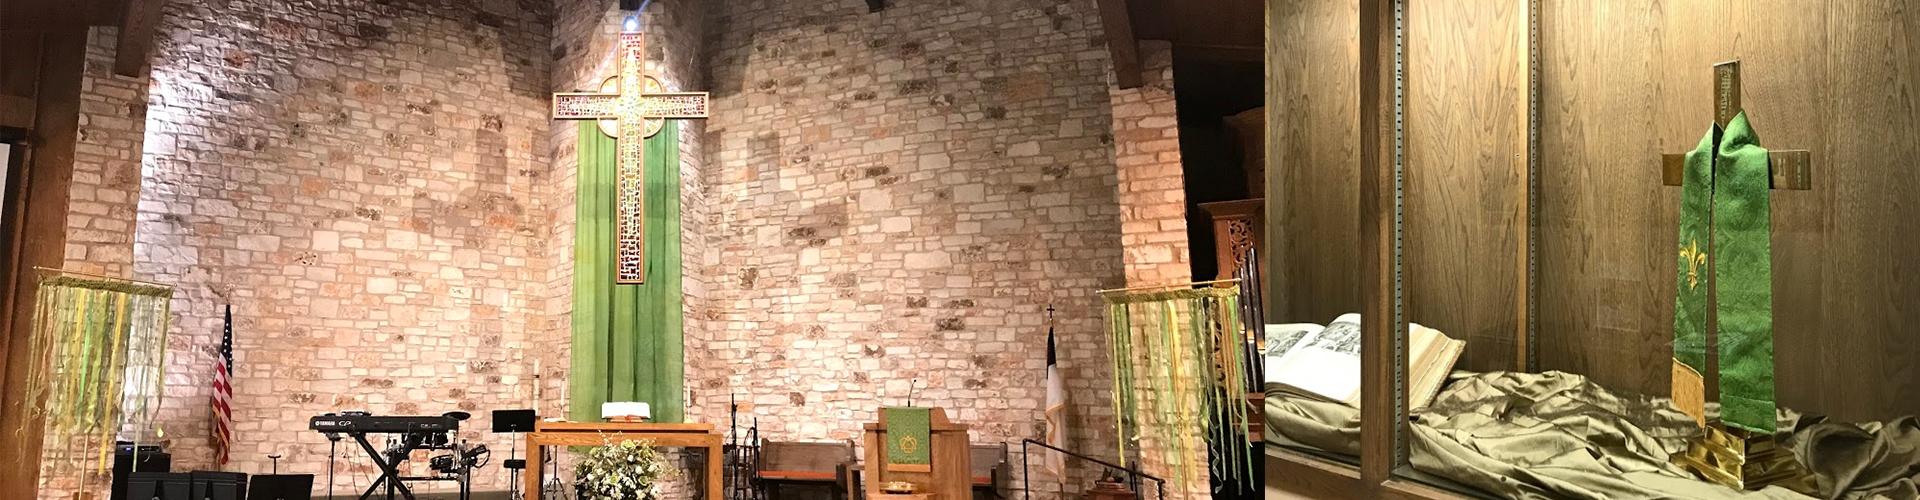 The Liturgical Year – Fredericksburg United Methodist Church